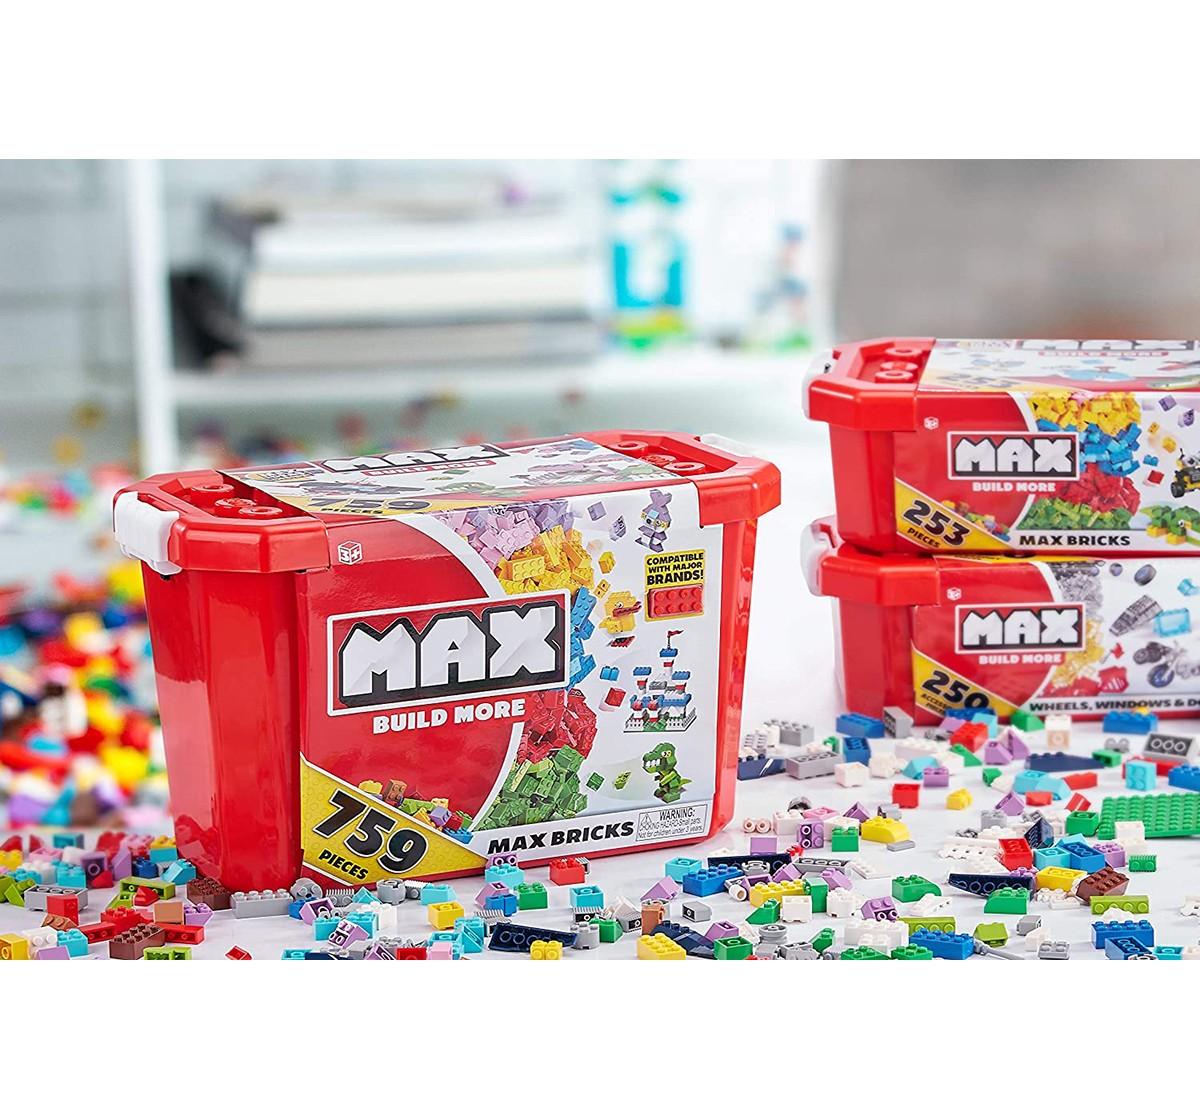 Zuru Max Build More Value Pack -759 Pcs Generic Blocks for Kids age 3Y+